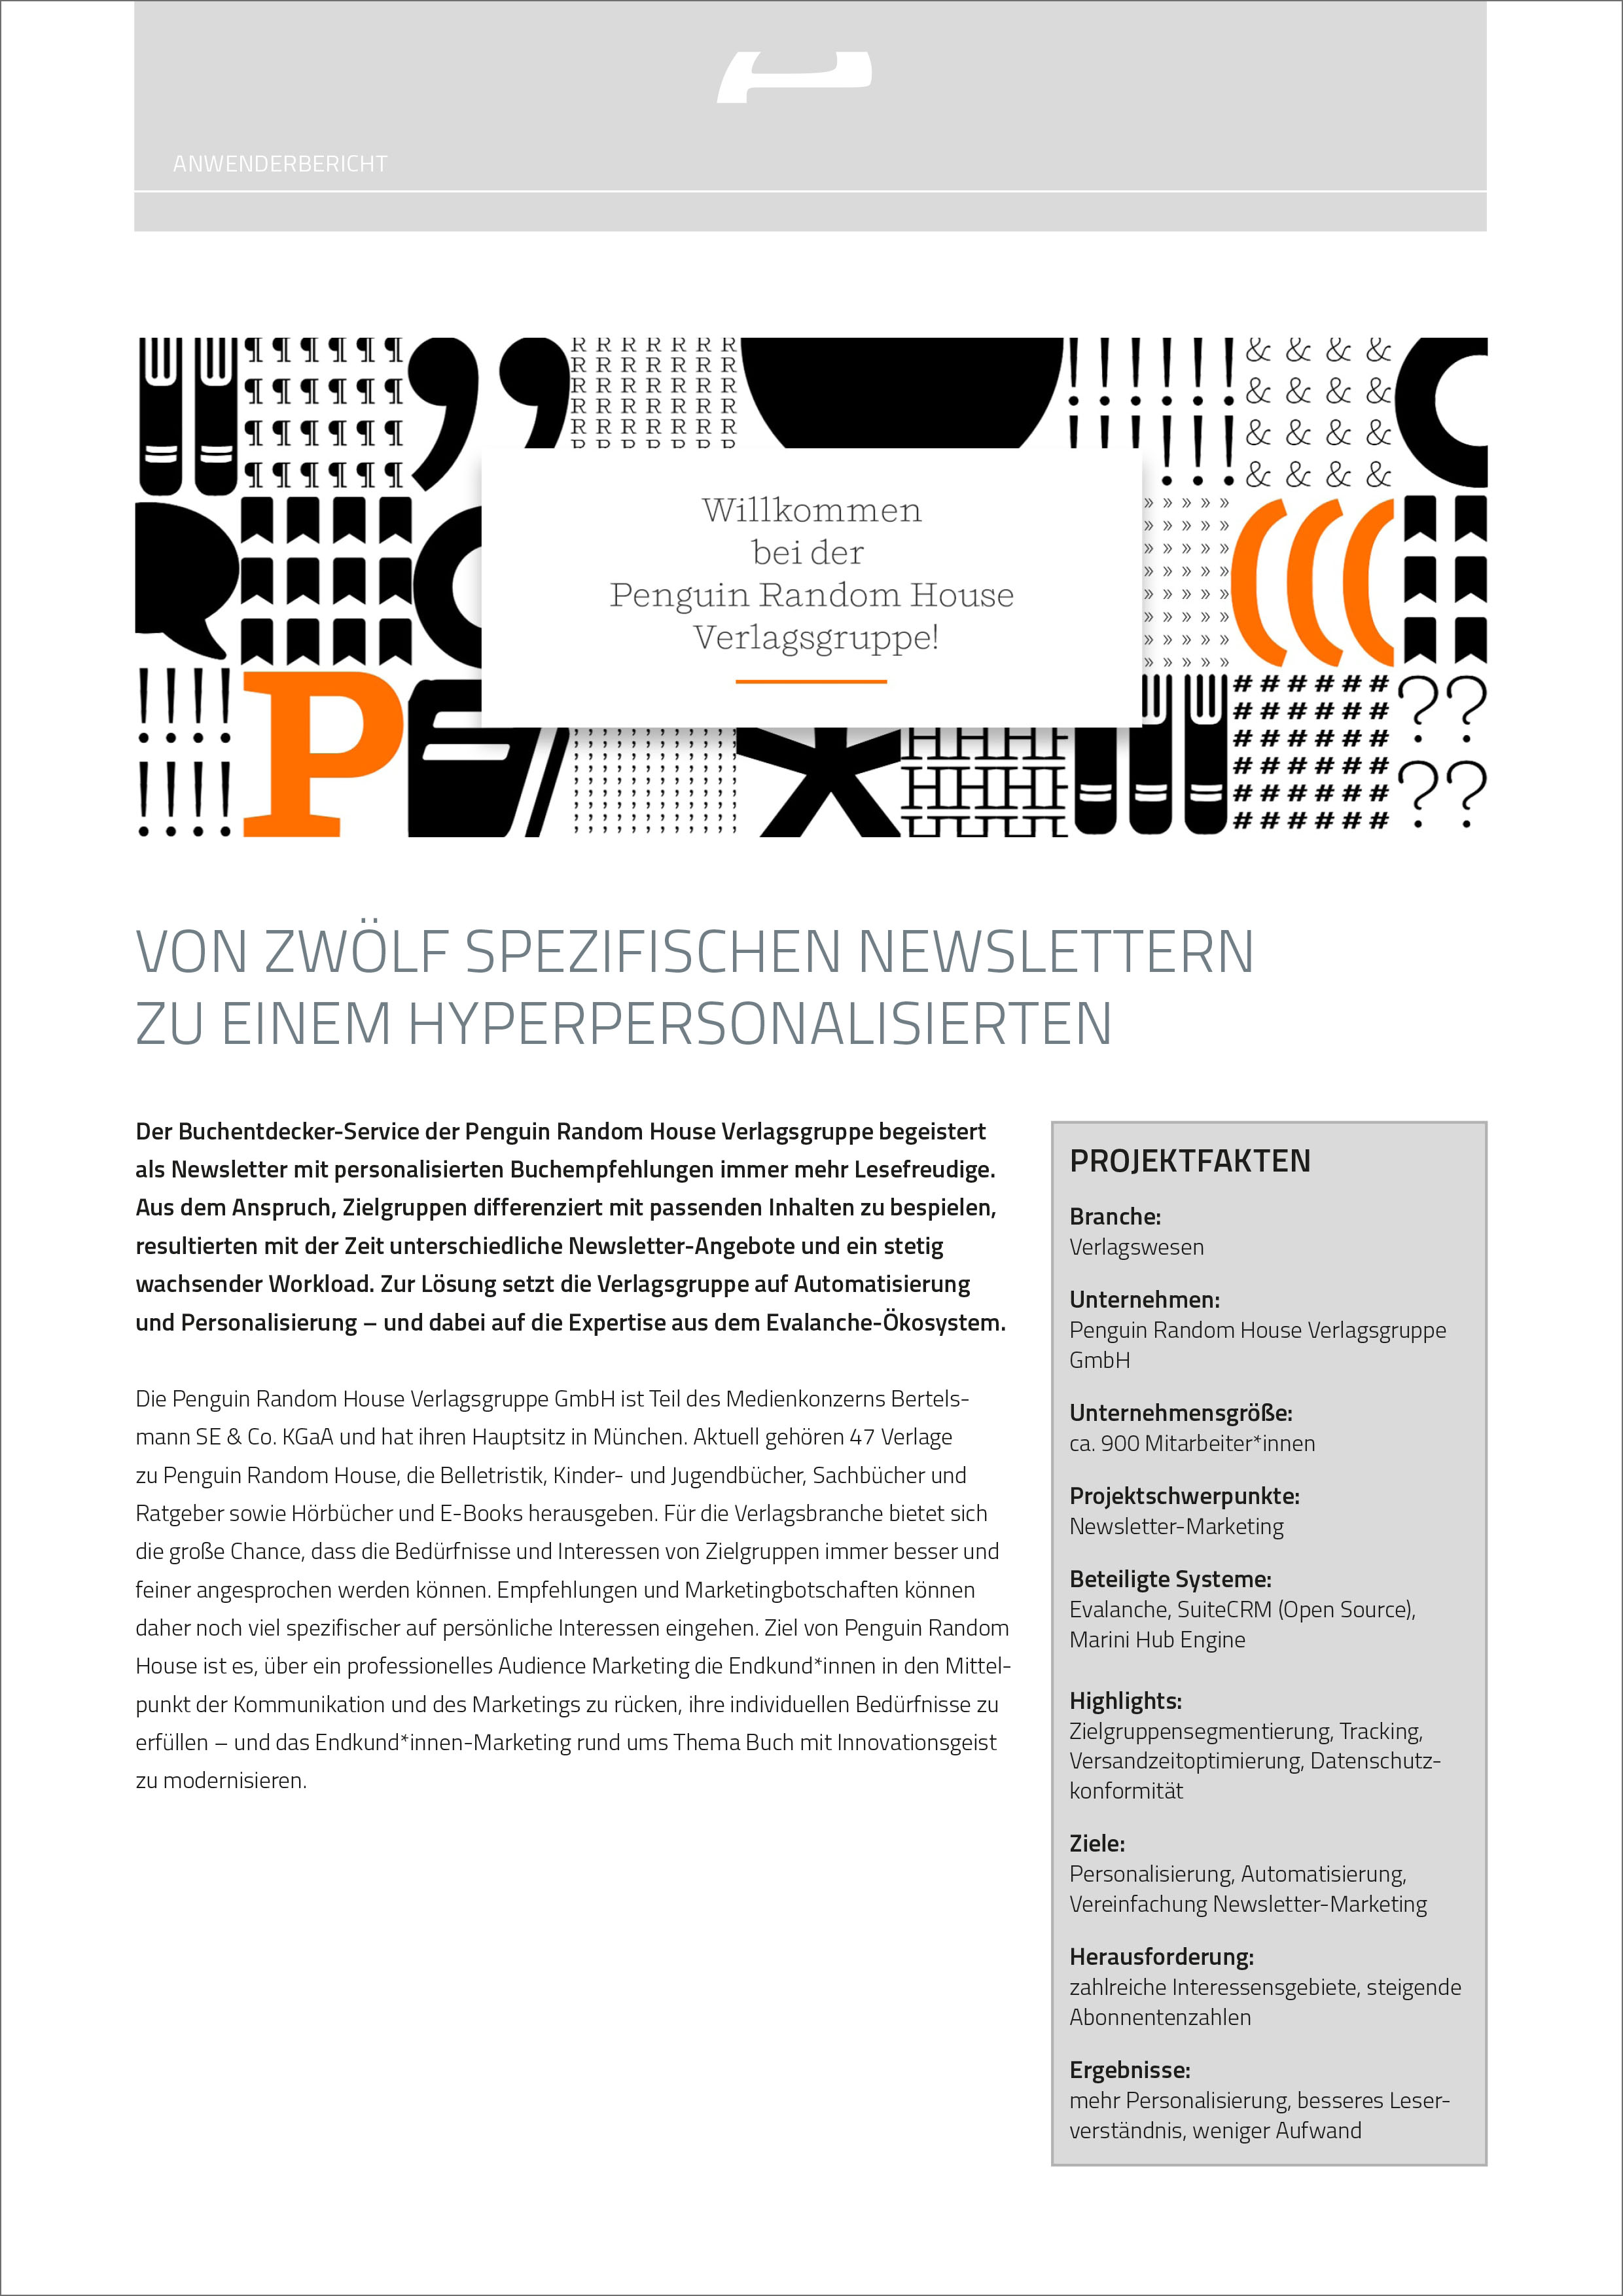 Anwenderbericht-PDF mit der Verlagsgruppe Penguin Random House